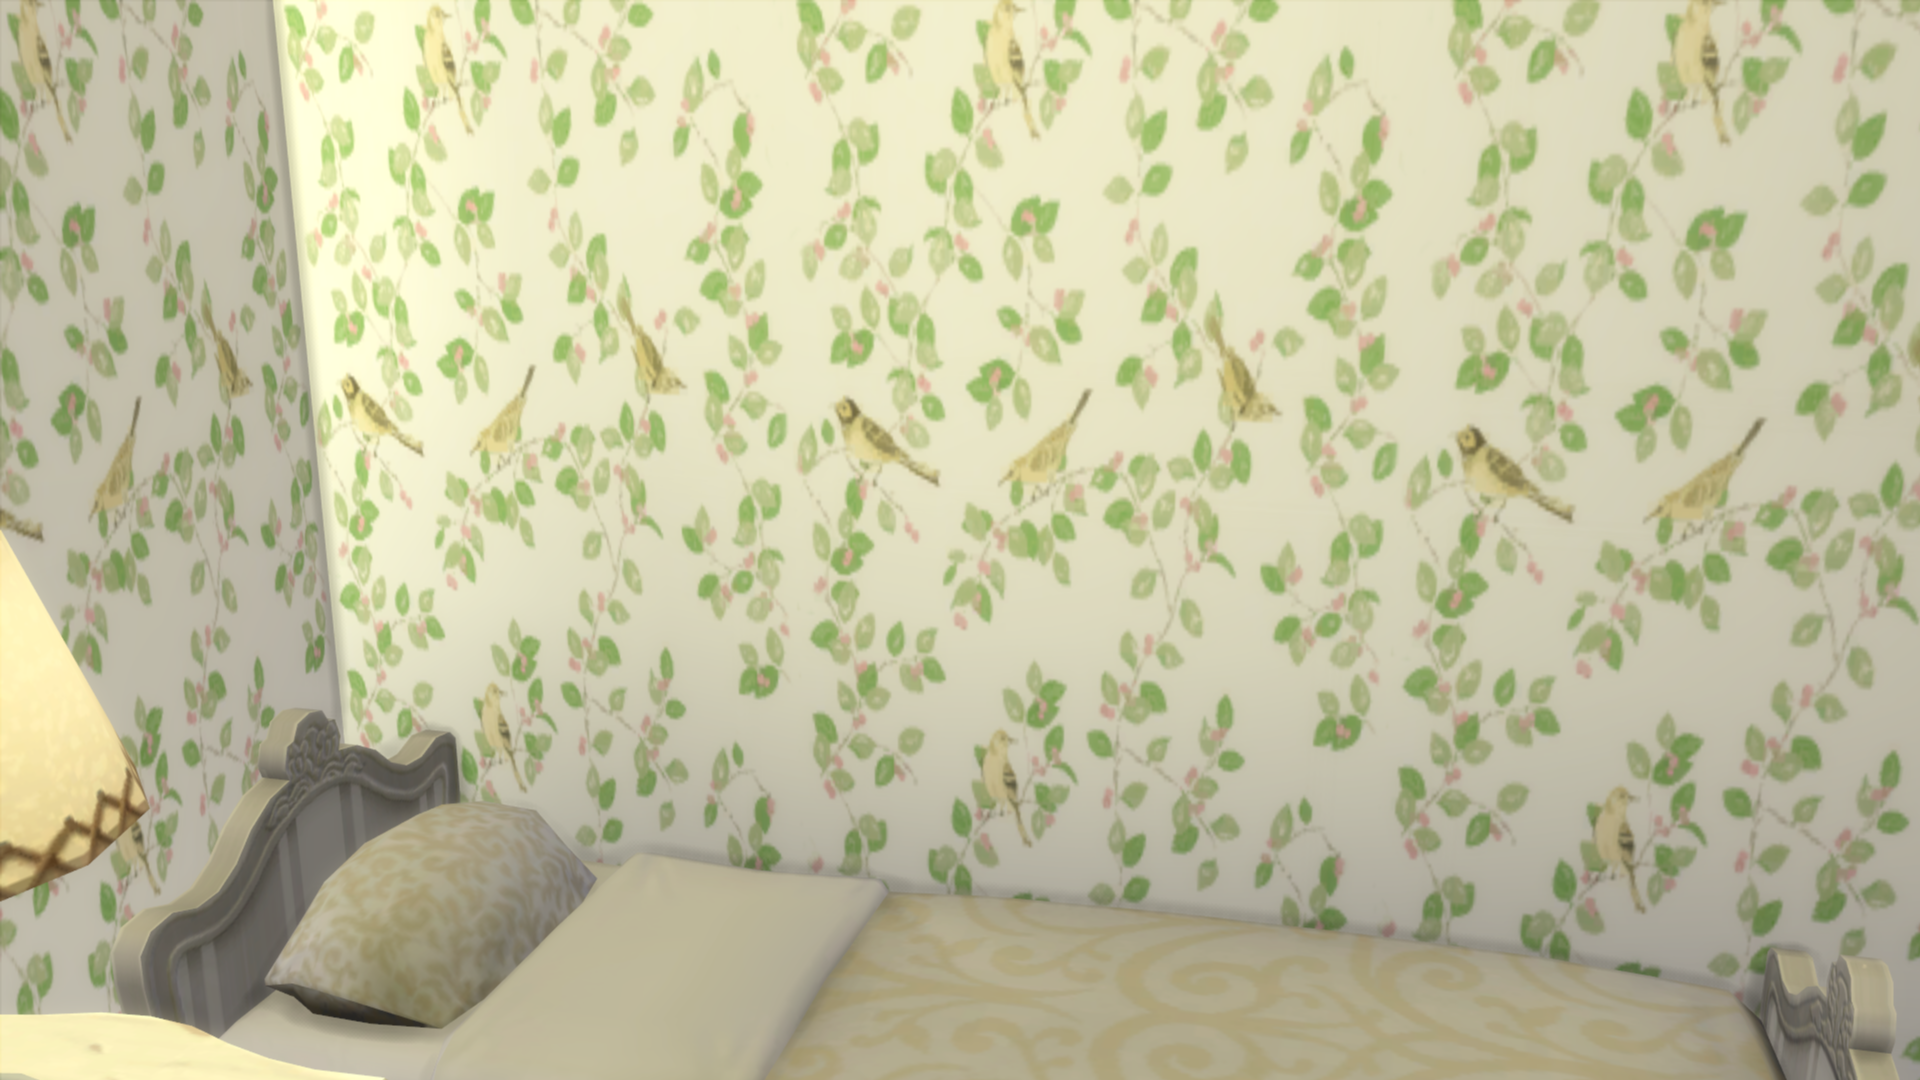 Sims 4 Laura Ashley Green Bird Wallpaper